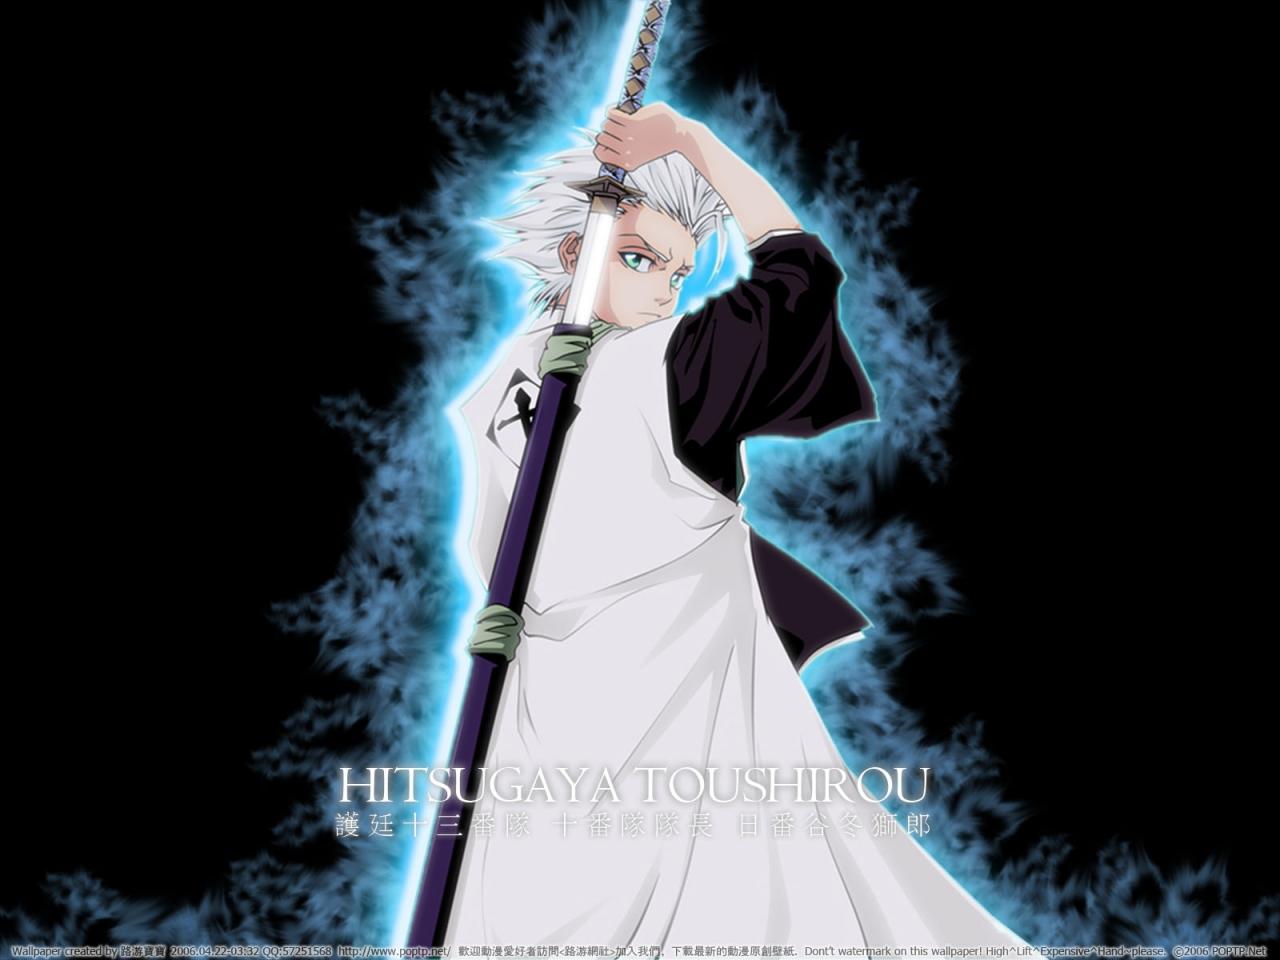 kisuke-bleach-anime-33097831-1280-960.jpg